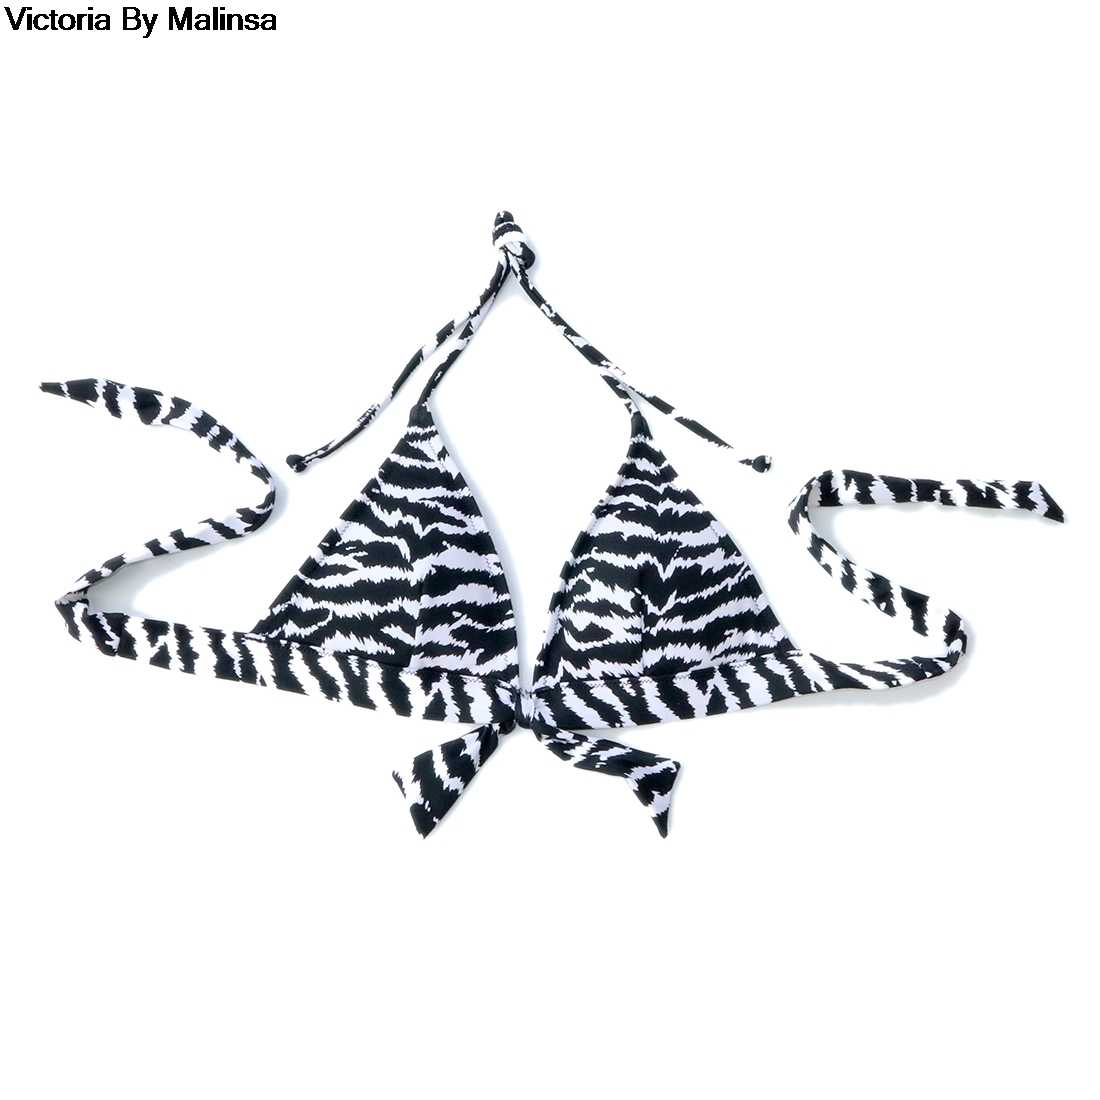 Vrouwen Bikini Sets Driehoek Blauw Sexy Secret Sathing Pak Zwart Lage Taille bikini Braziliaanse Badpak Badmode